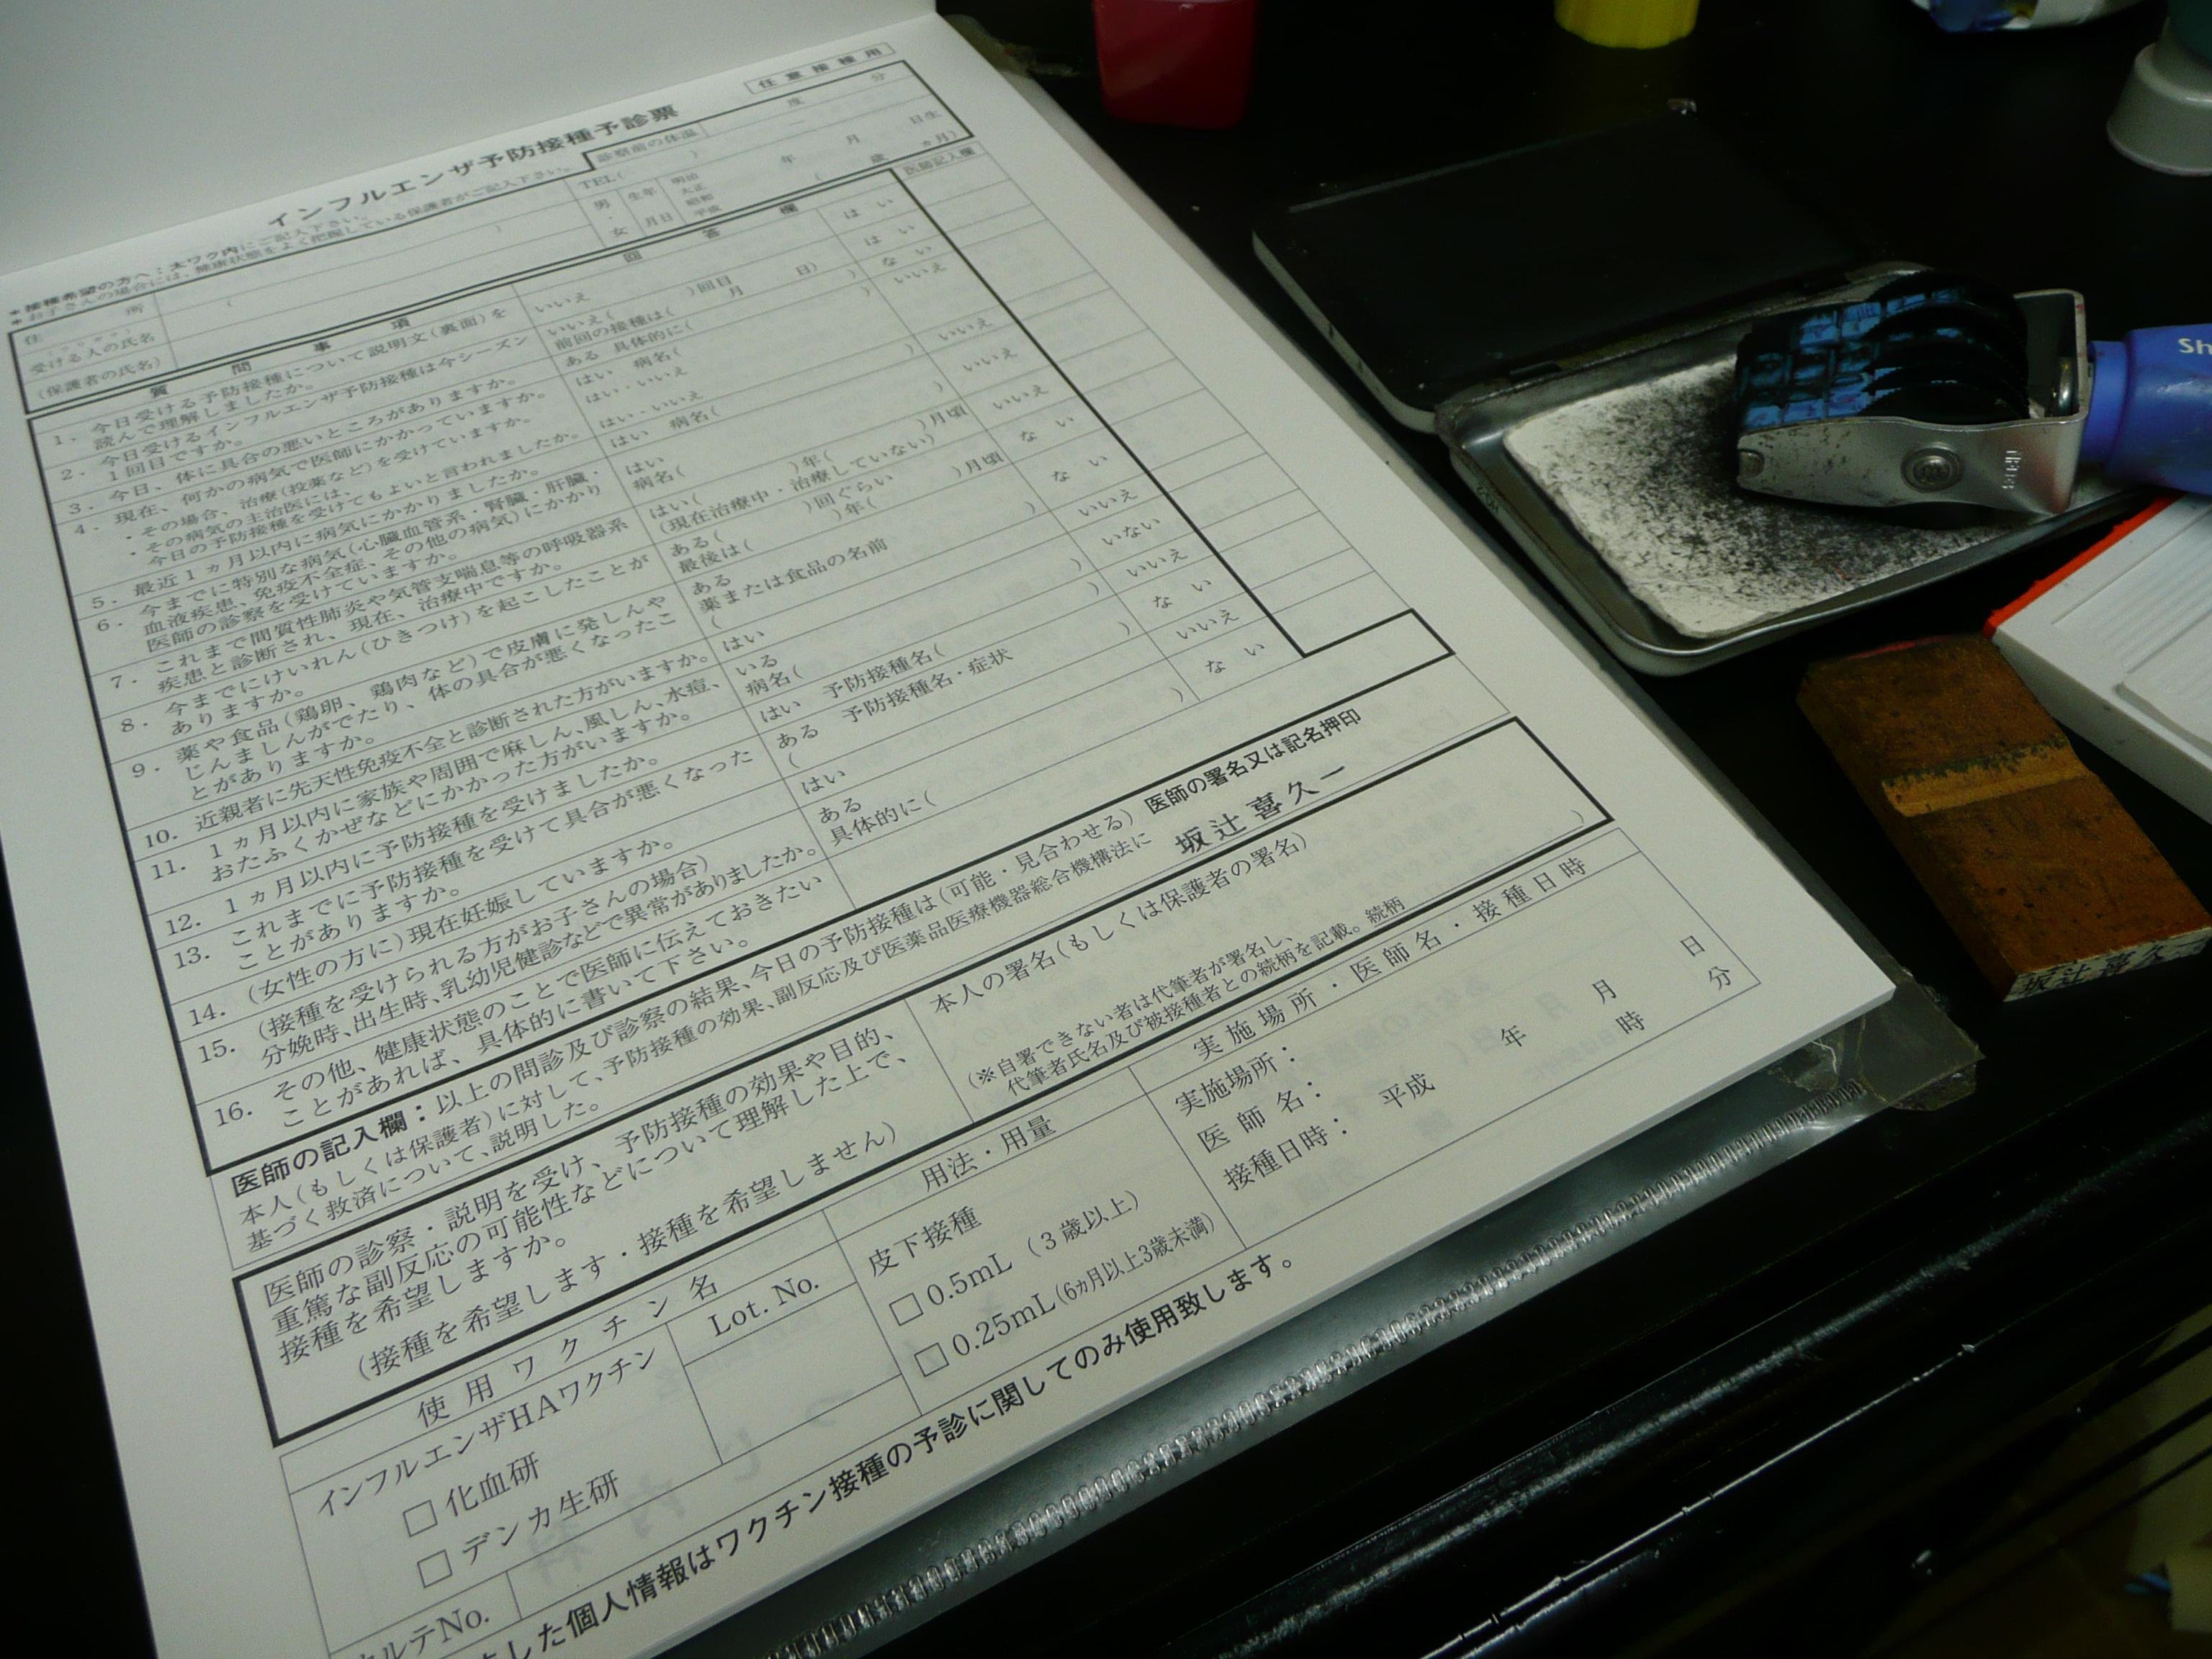 P1050162.JPG